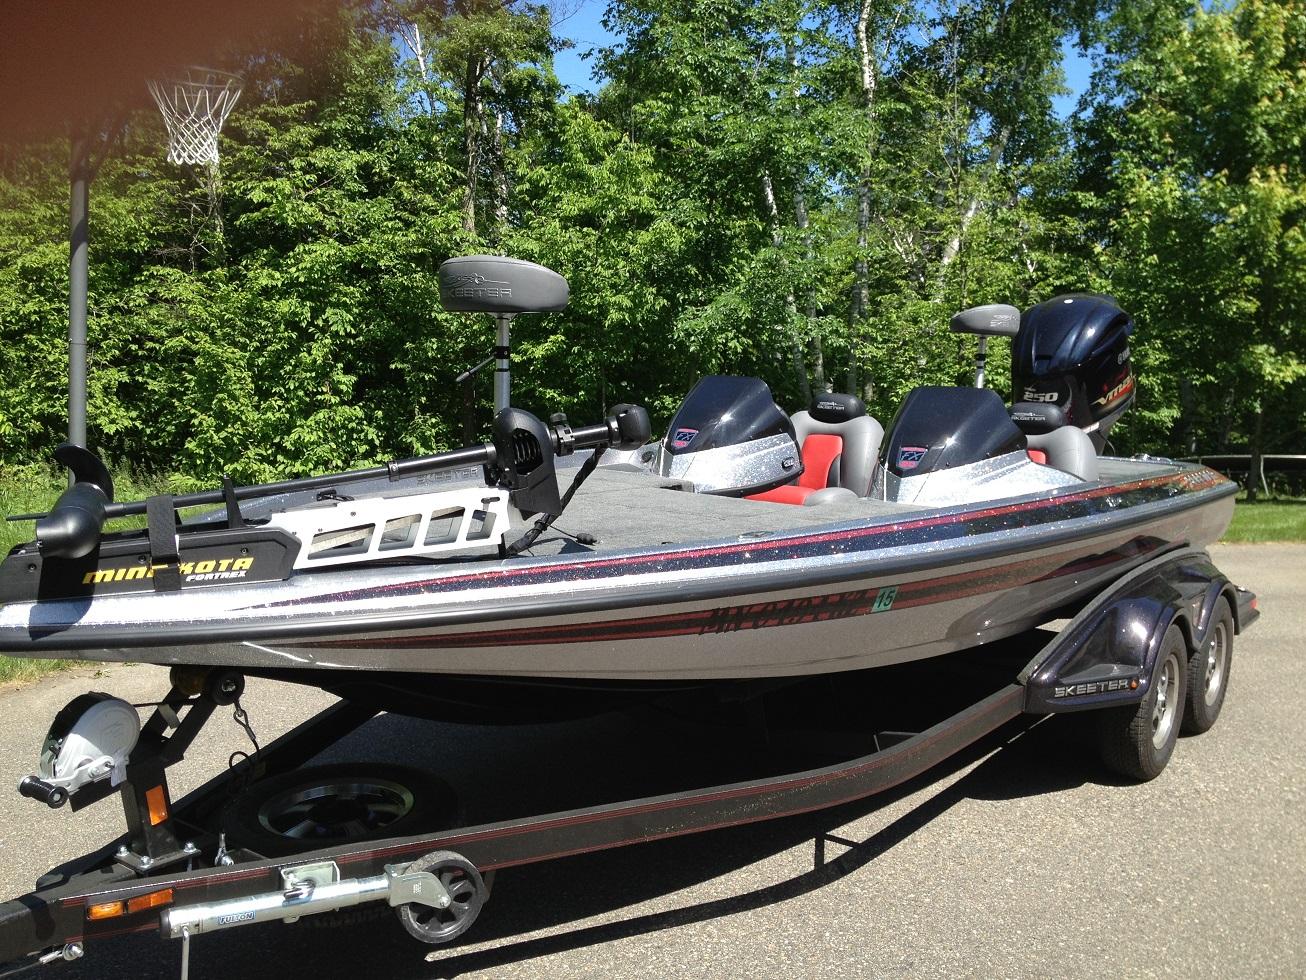 skeeter bass boat for sale - HD1306×980